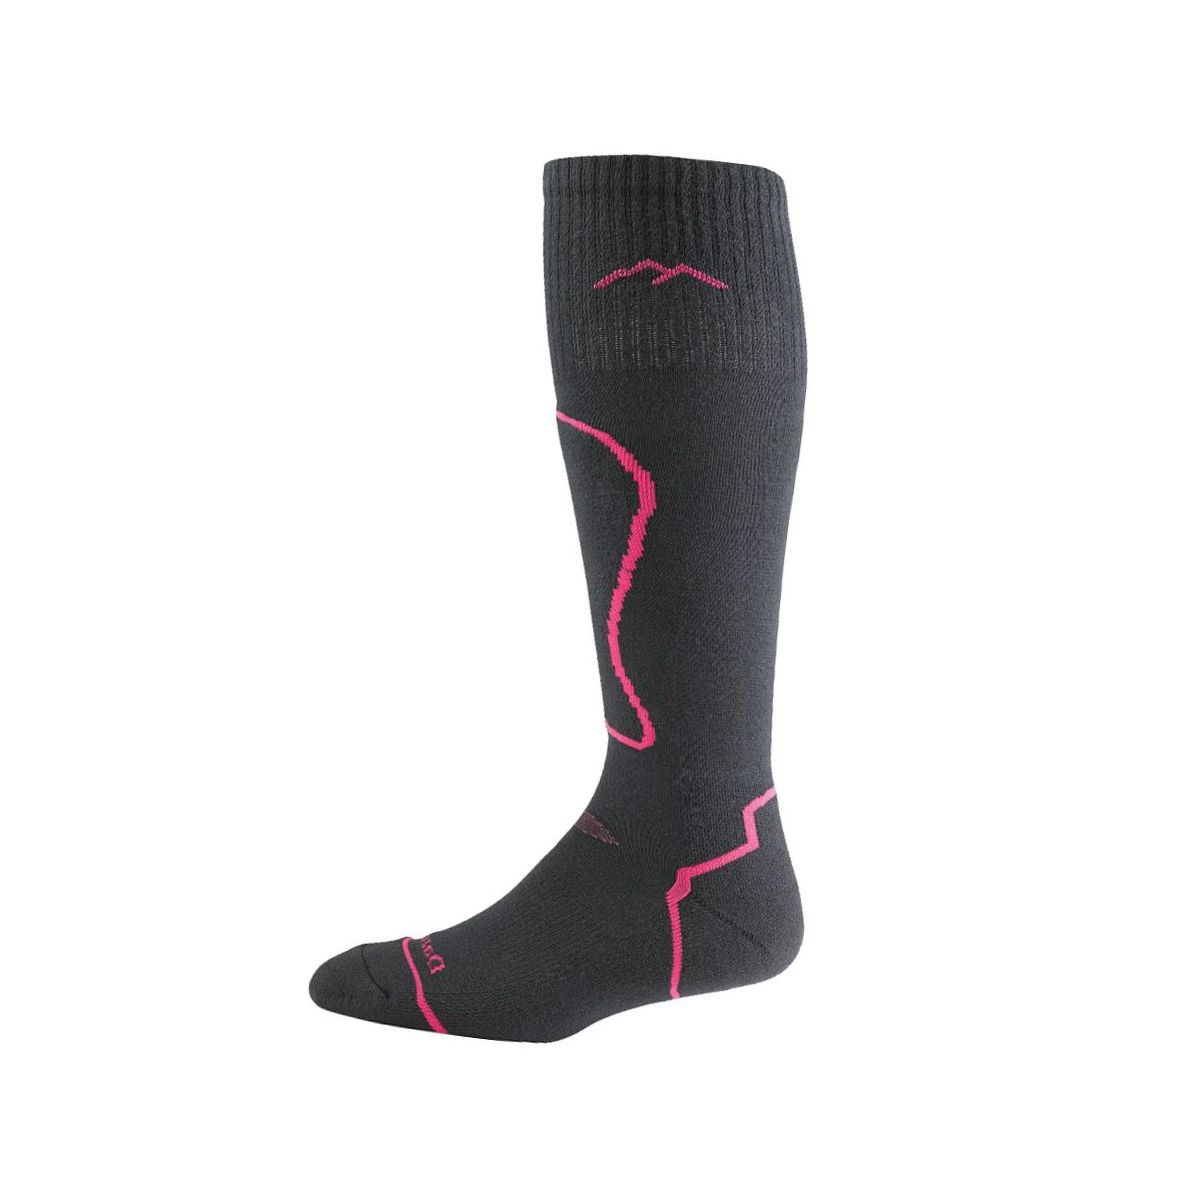 Darn Tough Thermolite OTC Padded Cushion Sock - Women's